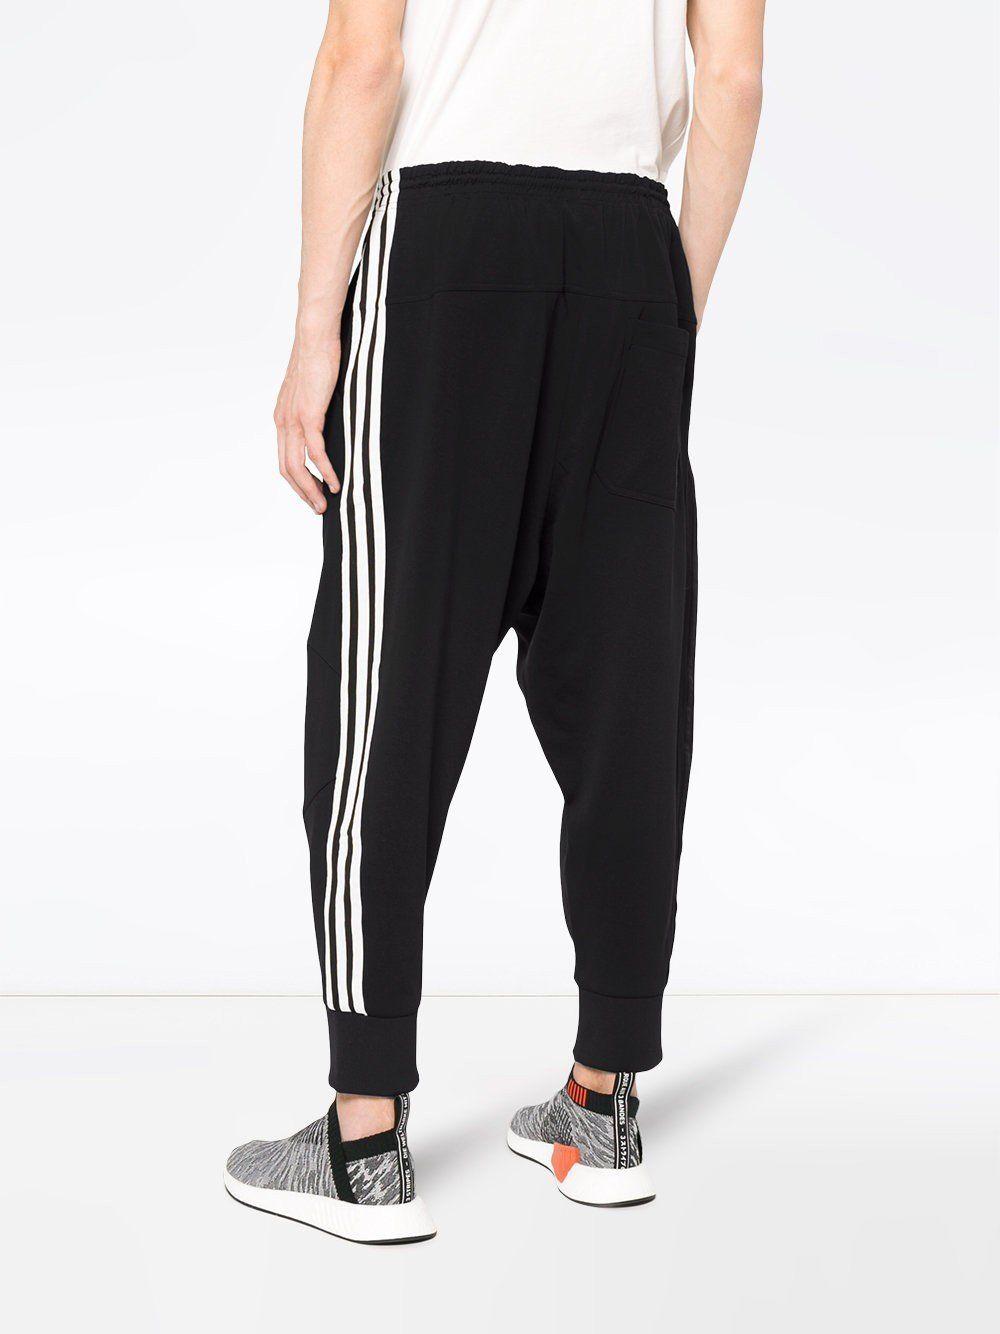 1de026de6121 Three Stripes Track Pants - Adidas Y-3 Yohji Yamamoto